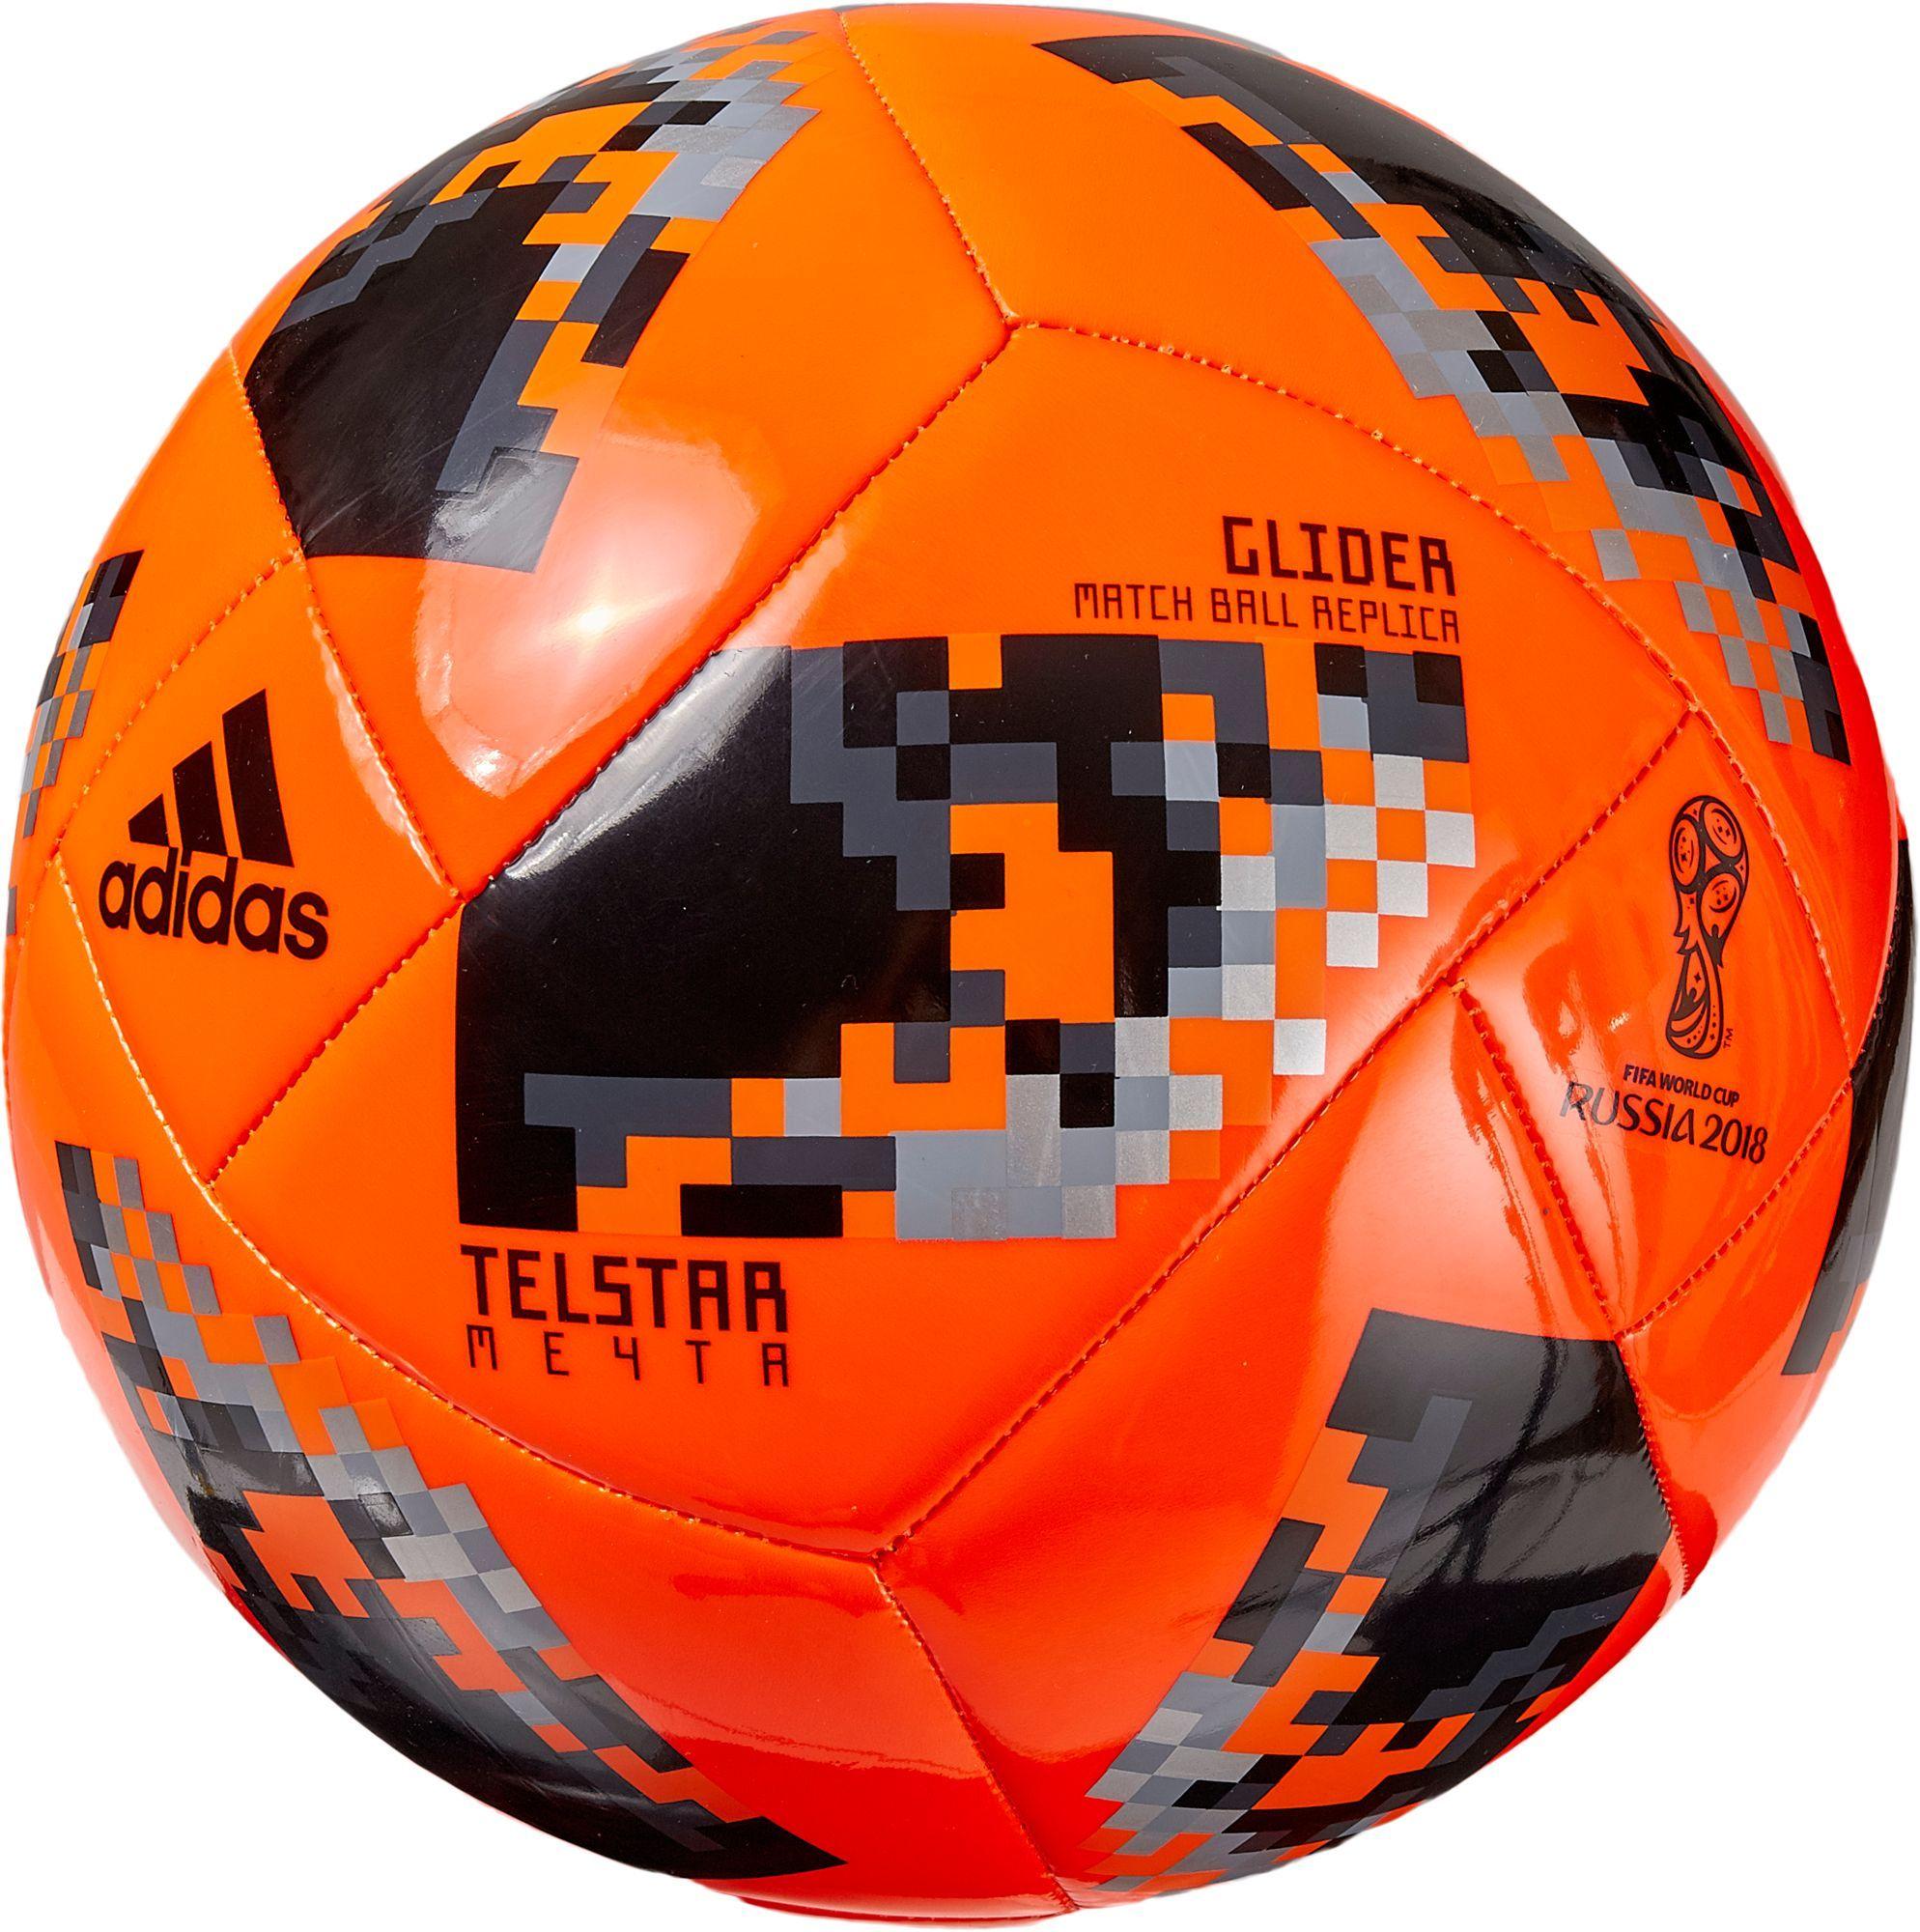 adidas 2018 Fifa World Cup Telstar Mechta Knockout Stage Glider Soccer  Ball e7063ae5ebcb5